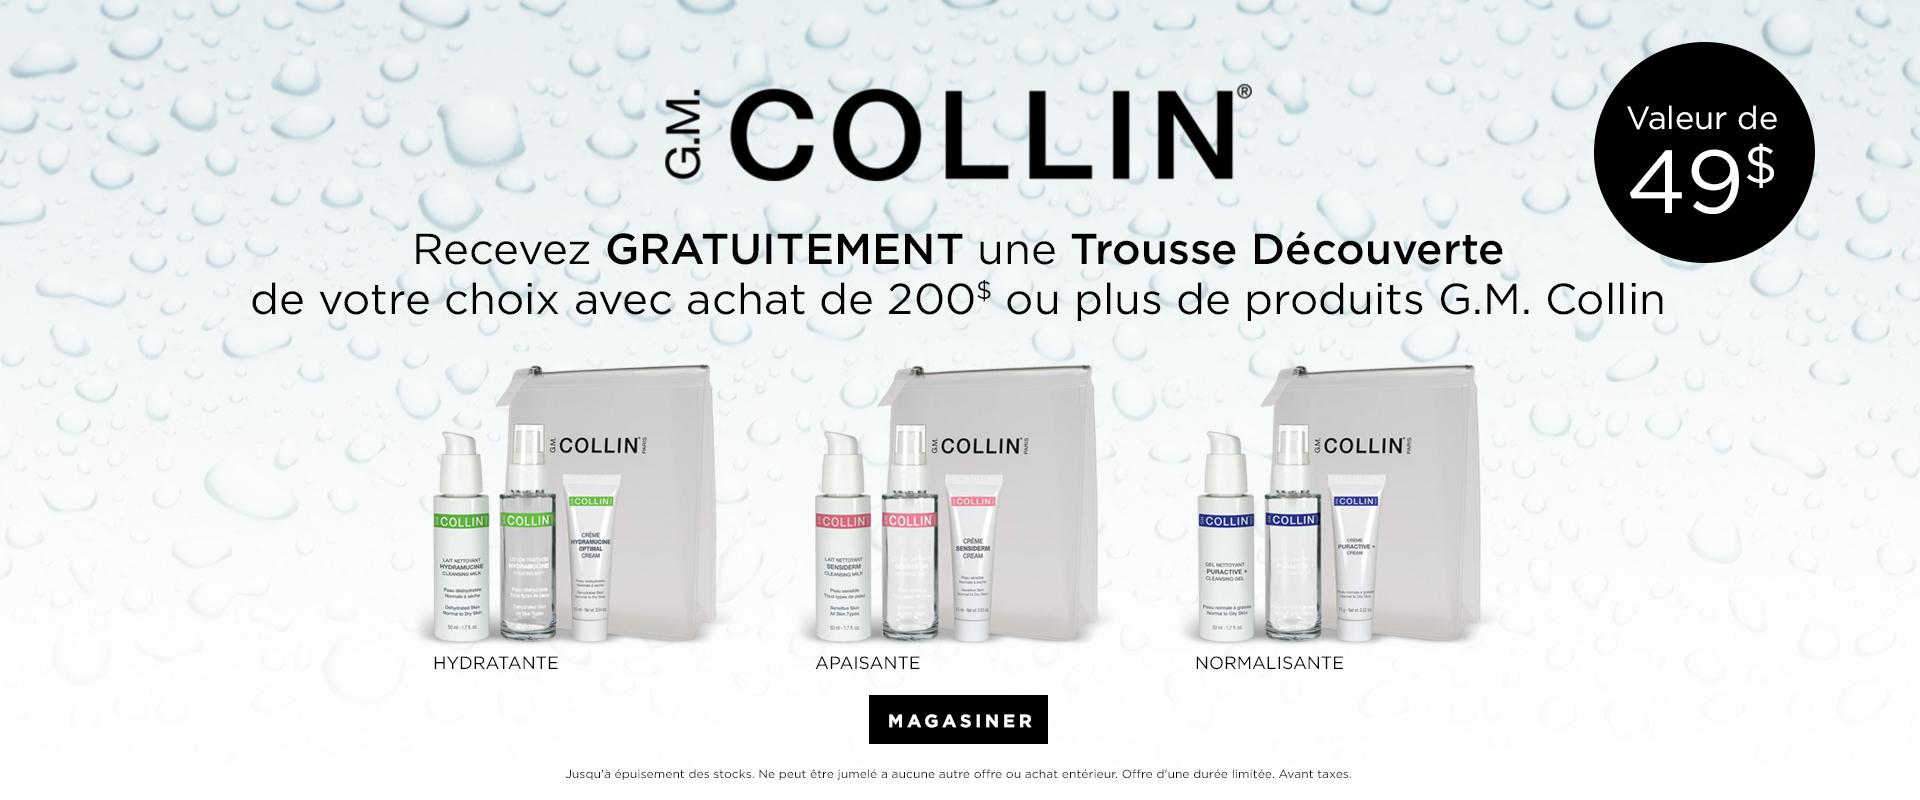 GM Collin